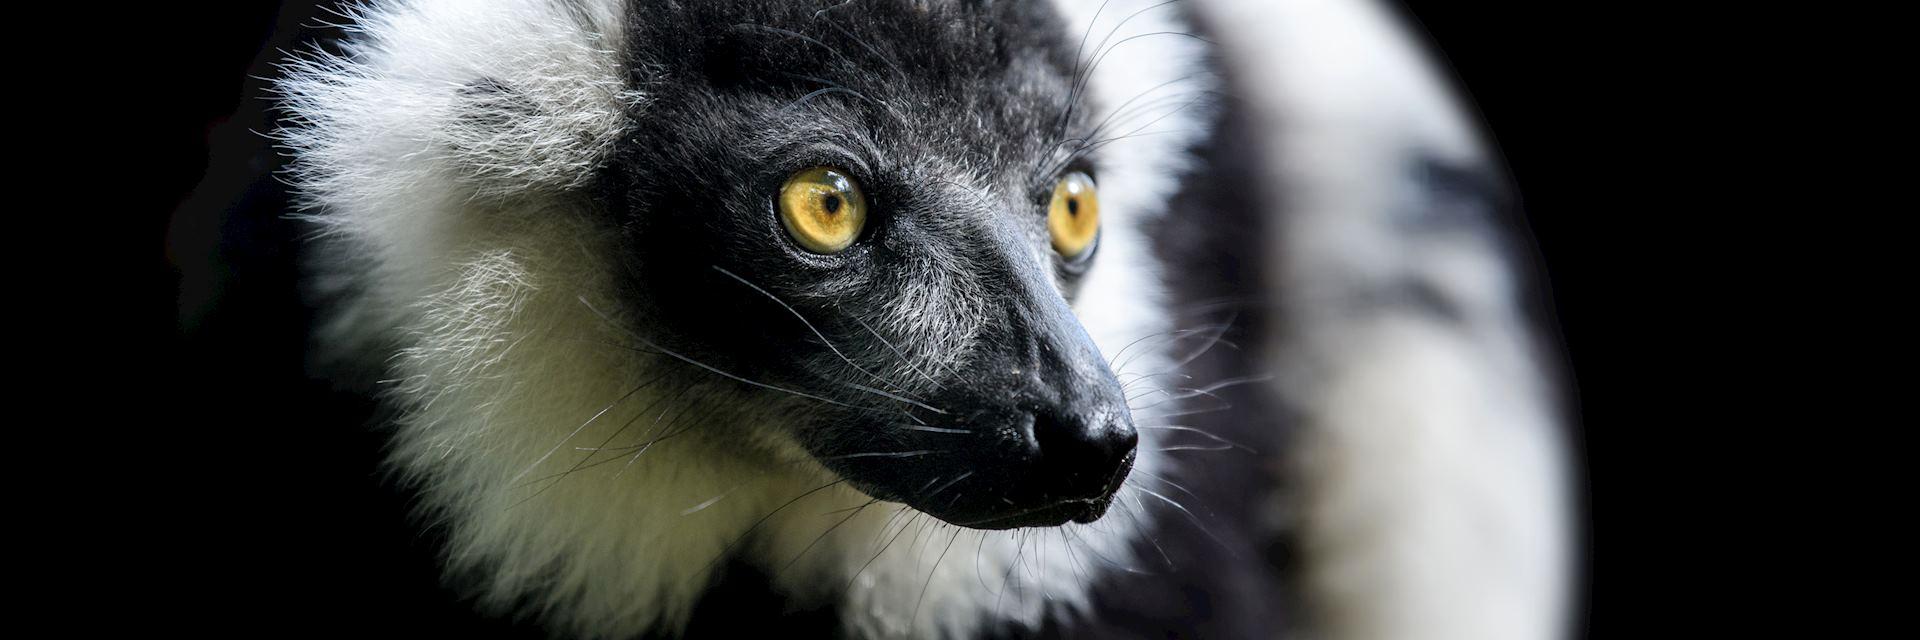 Black-and-white ruffed lemur, Manafiafy